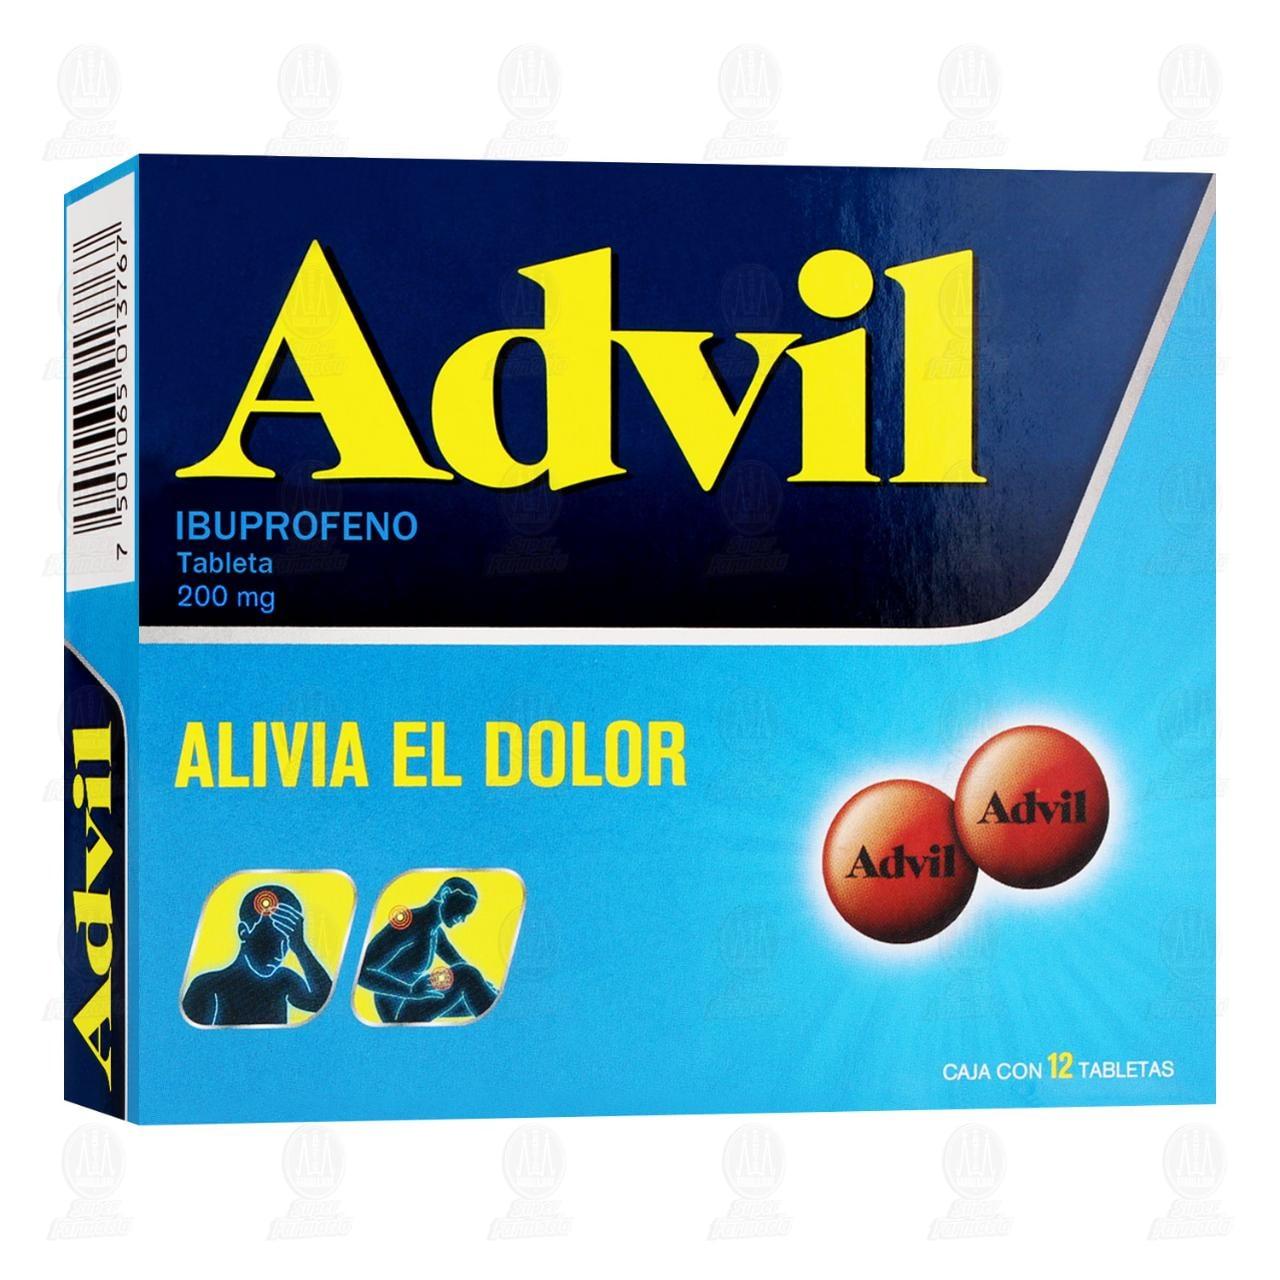 Comprar Advil 200mg 12 Tabletas en Farmacias Guadalajara